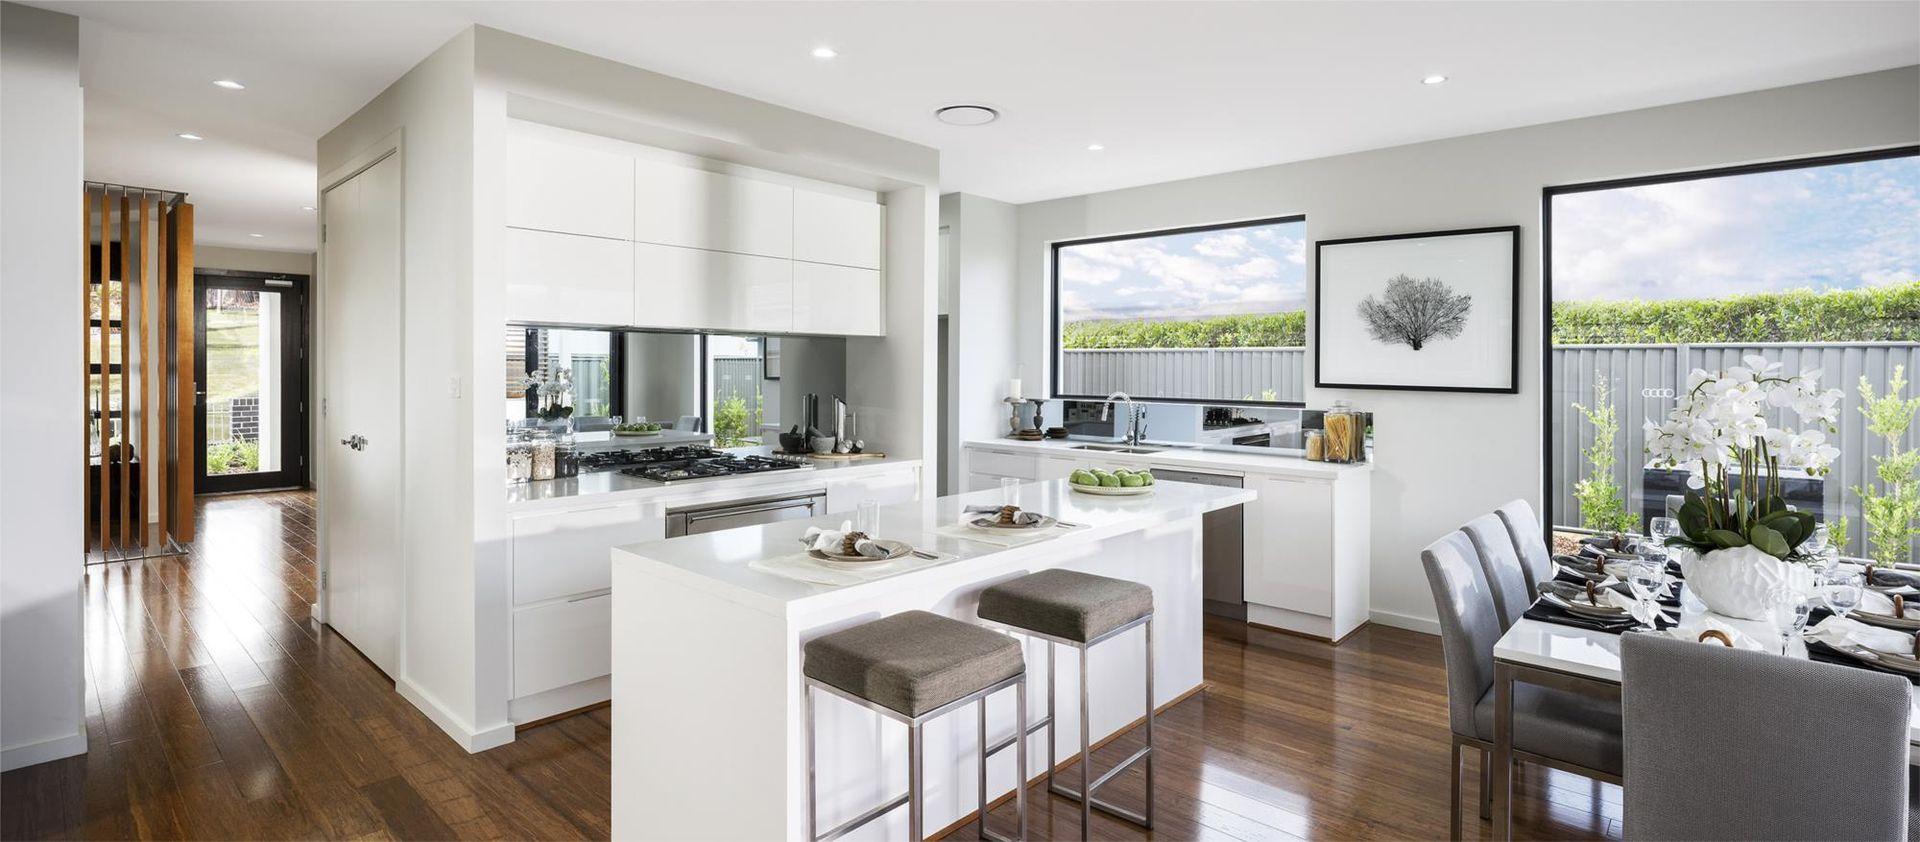 Lot 119 Proposed Road, Hamlyn Terrace NSW 2259, Image 1